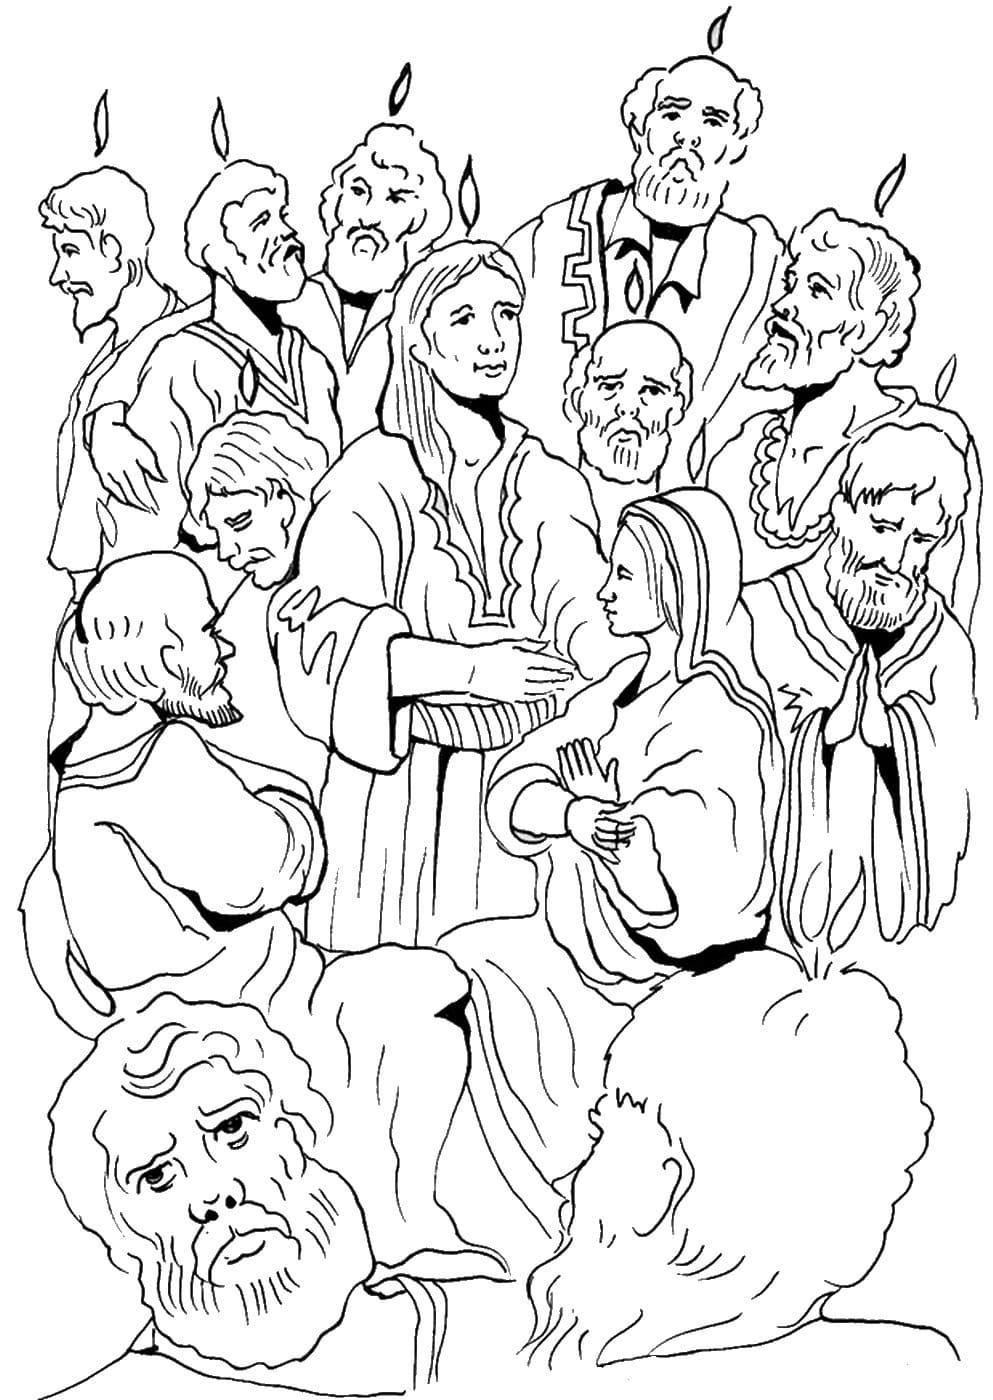 Pentecost 13